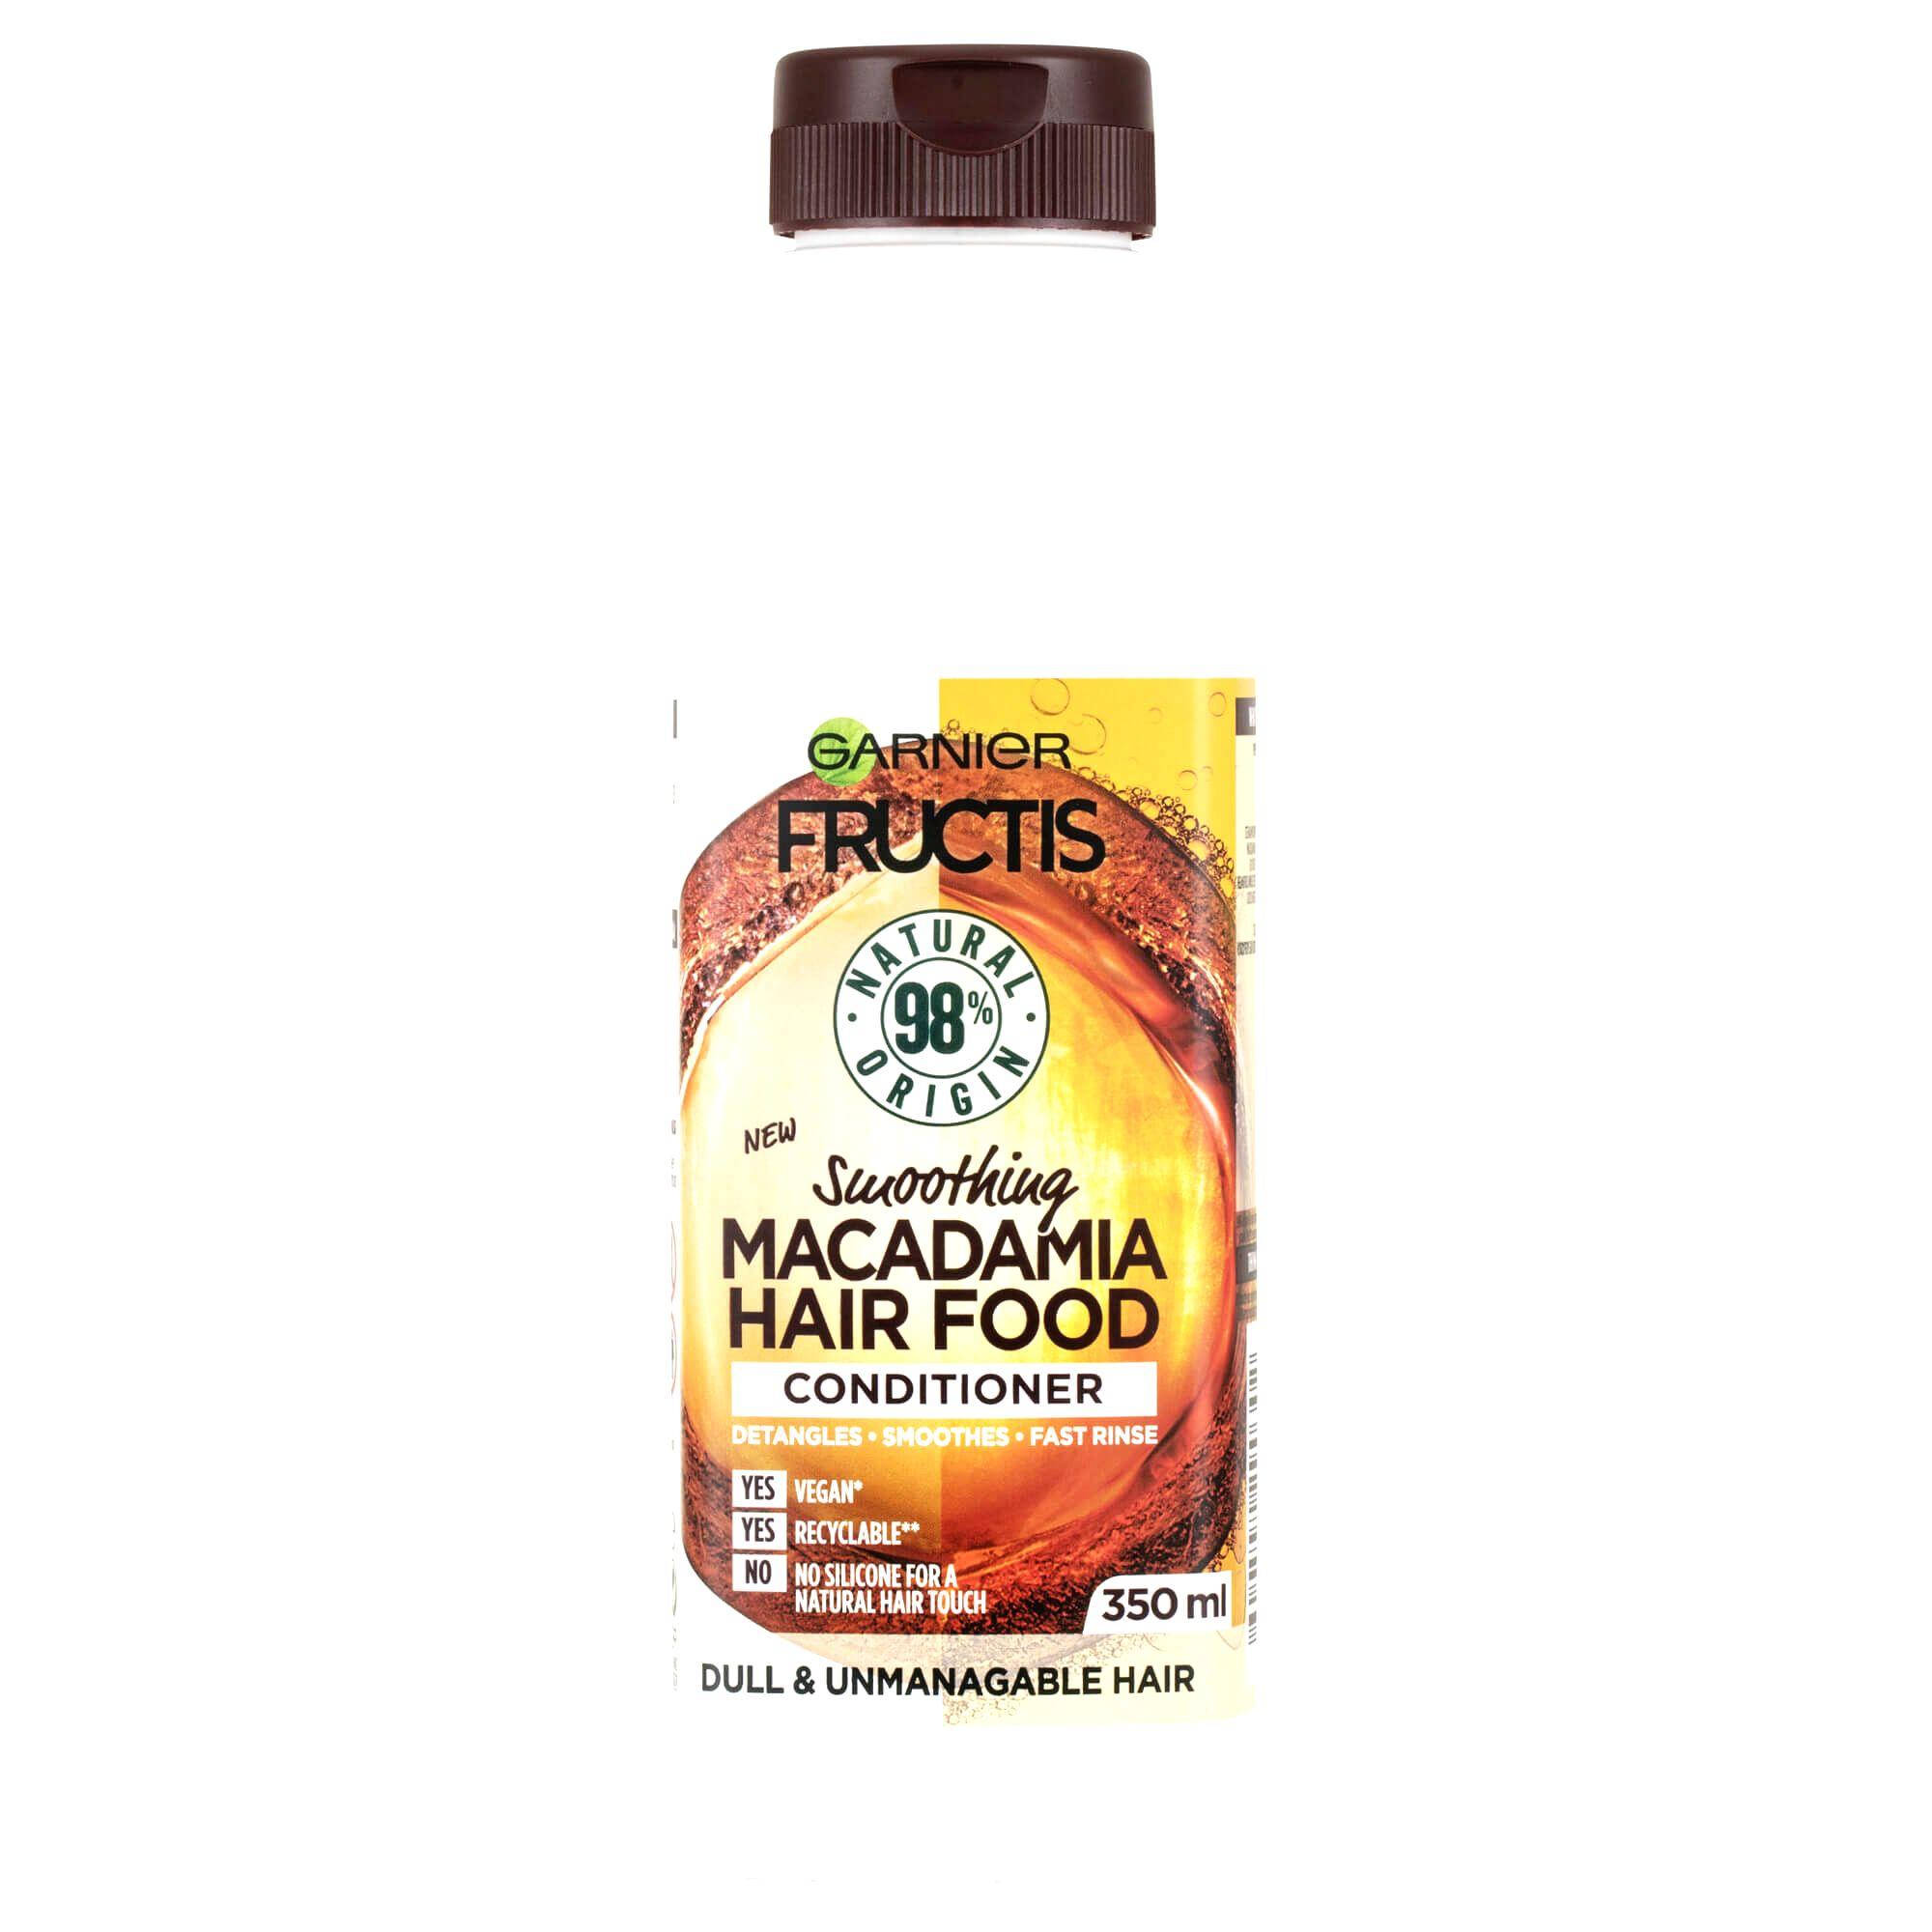 Garnier Uhladzujúci kondicionér pre nepoddajné vlasy Fructis Hair Food (Macadamia Smoothing Conditioner) 350 ml